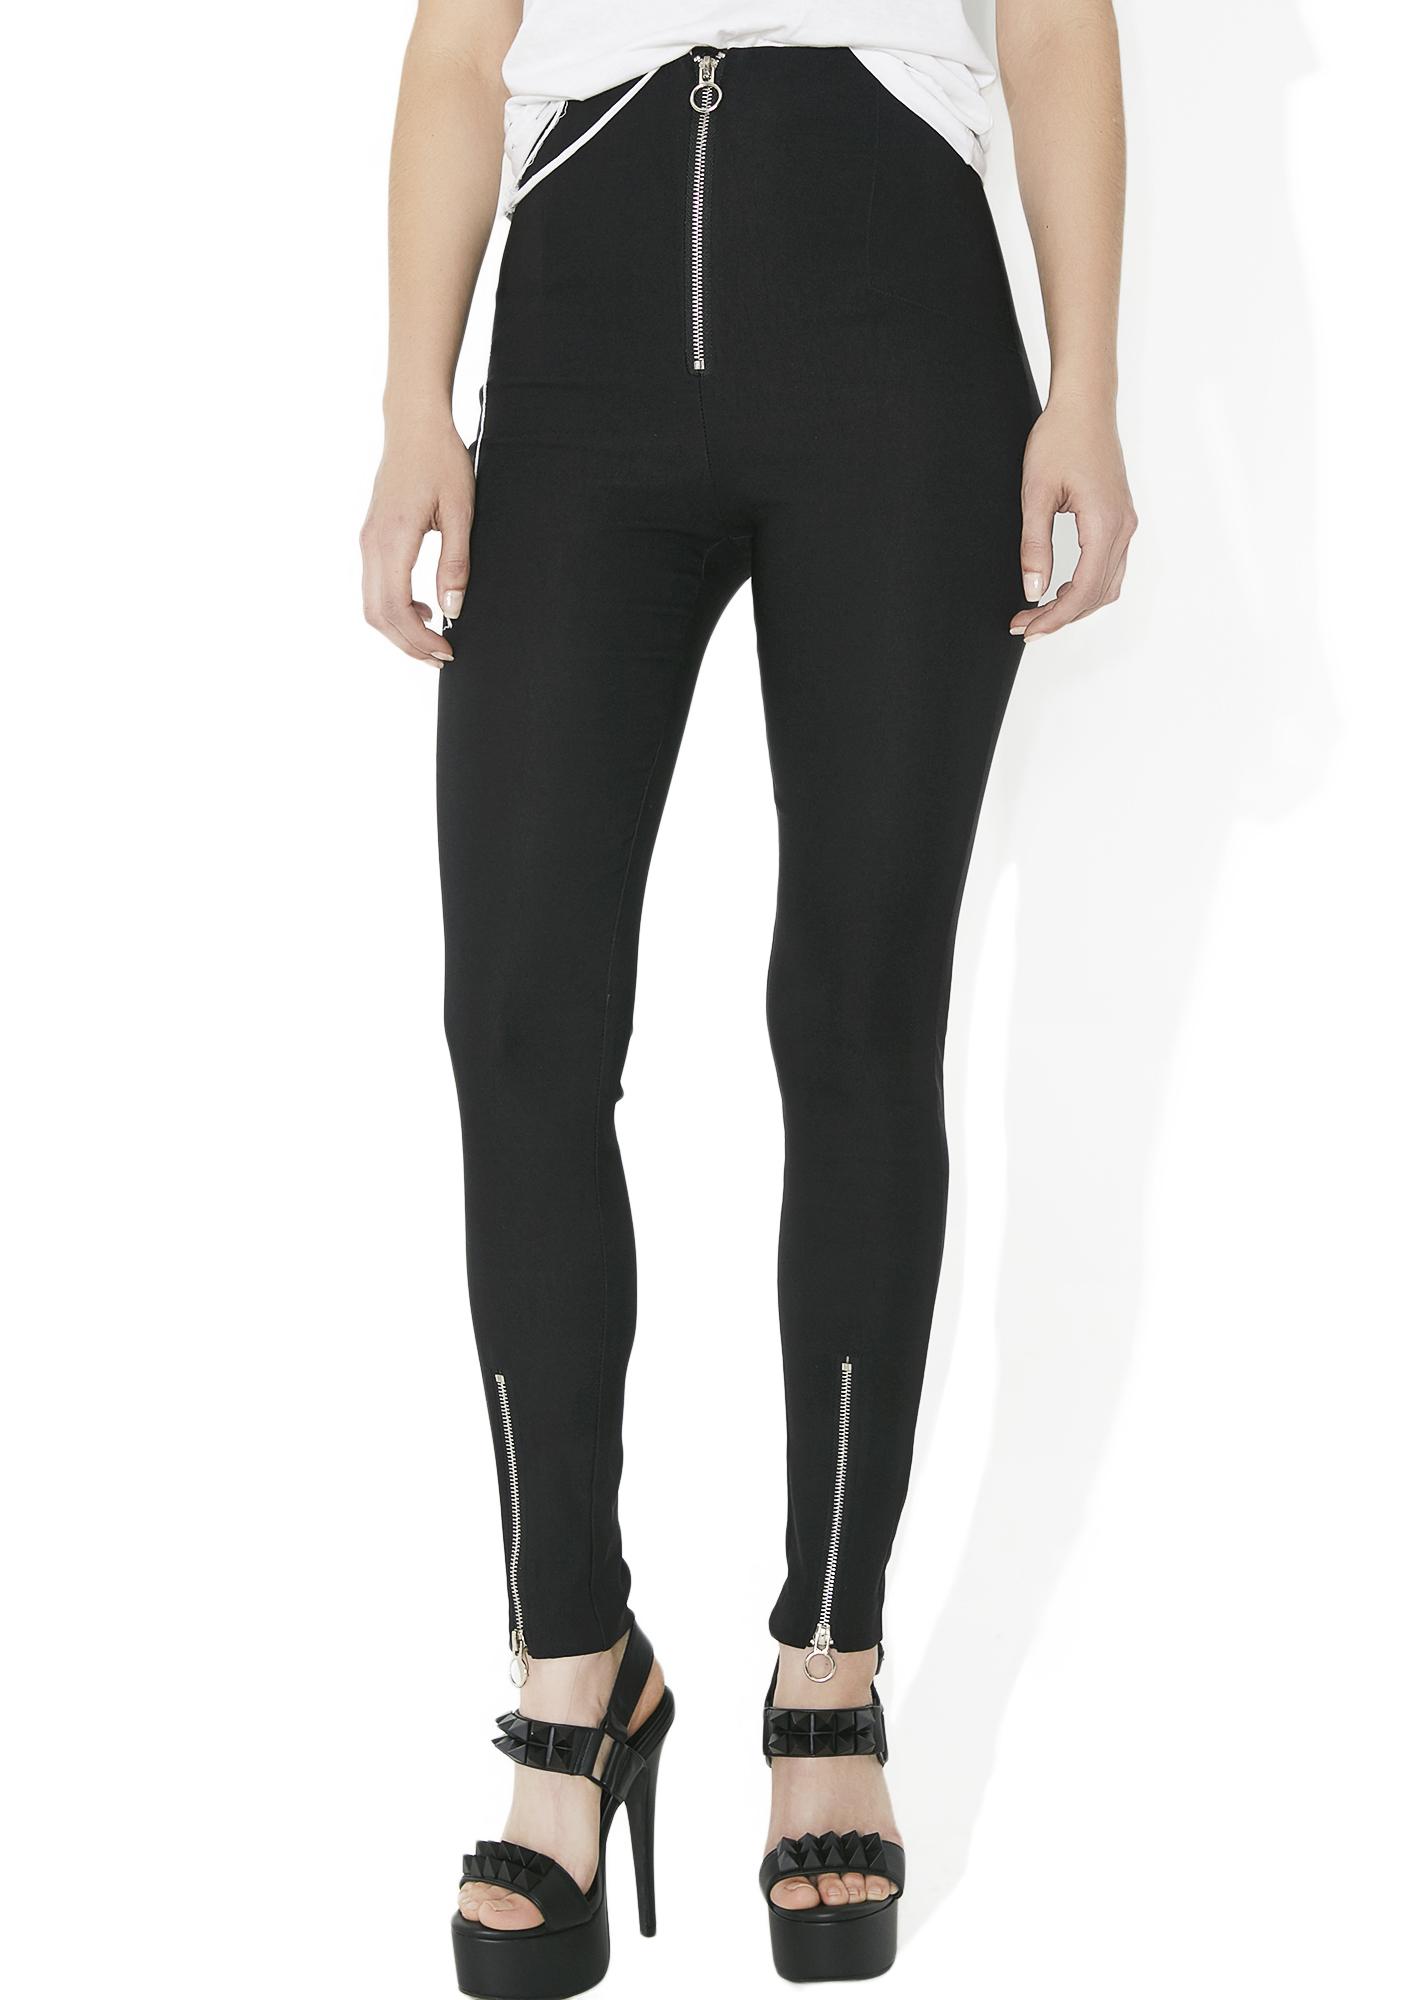 Black Skinny Zipper Pants